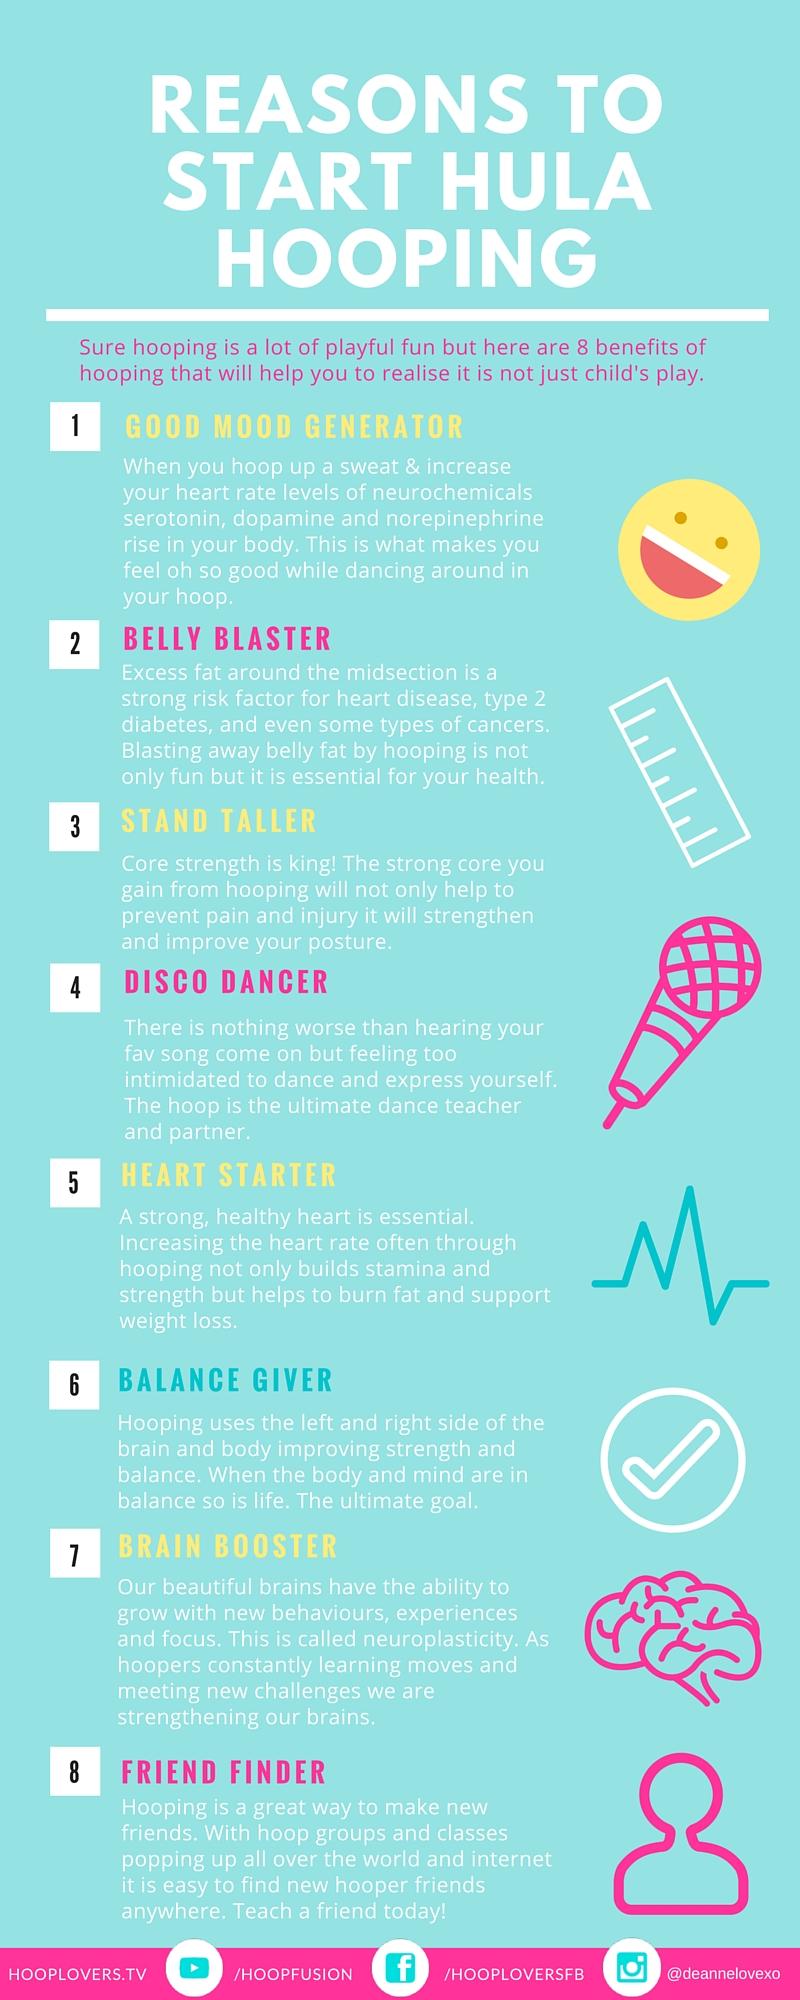 REASONS TO START HOOPING